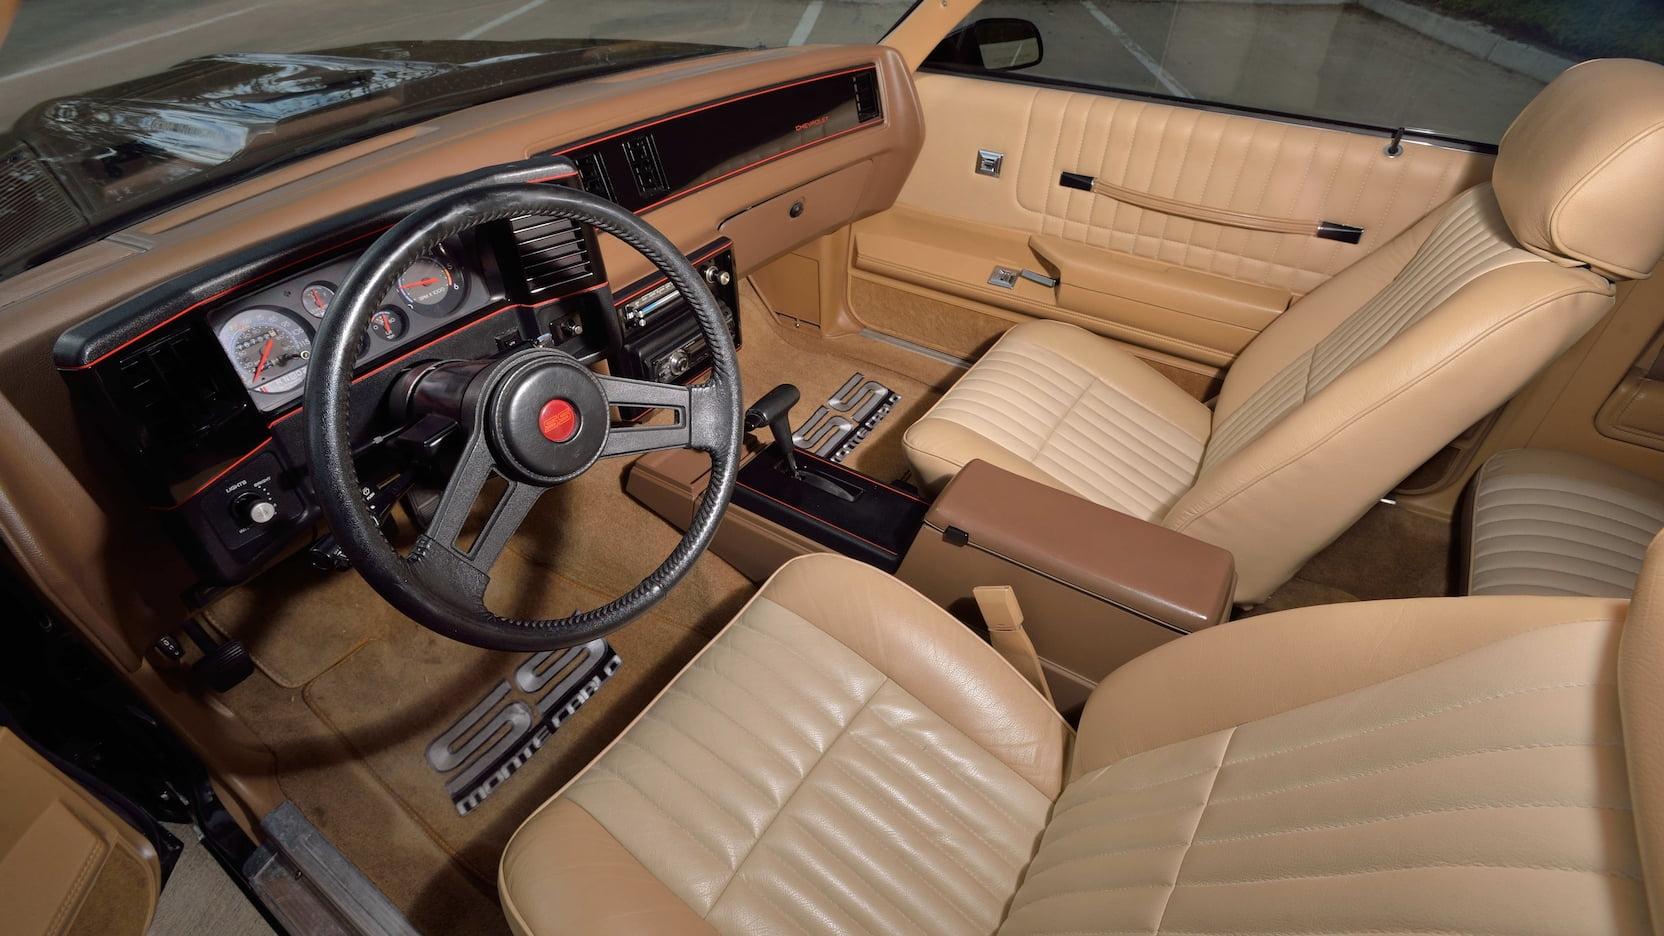 1988 Chevrolet Monte Carlo SS interior